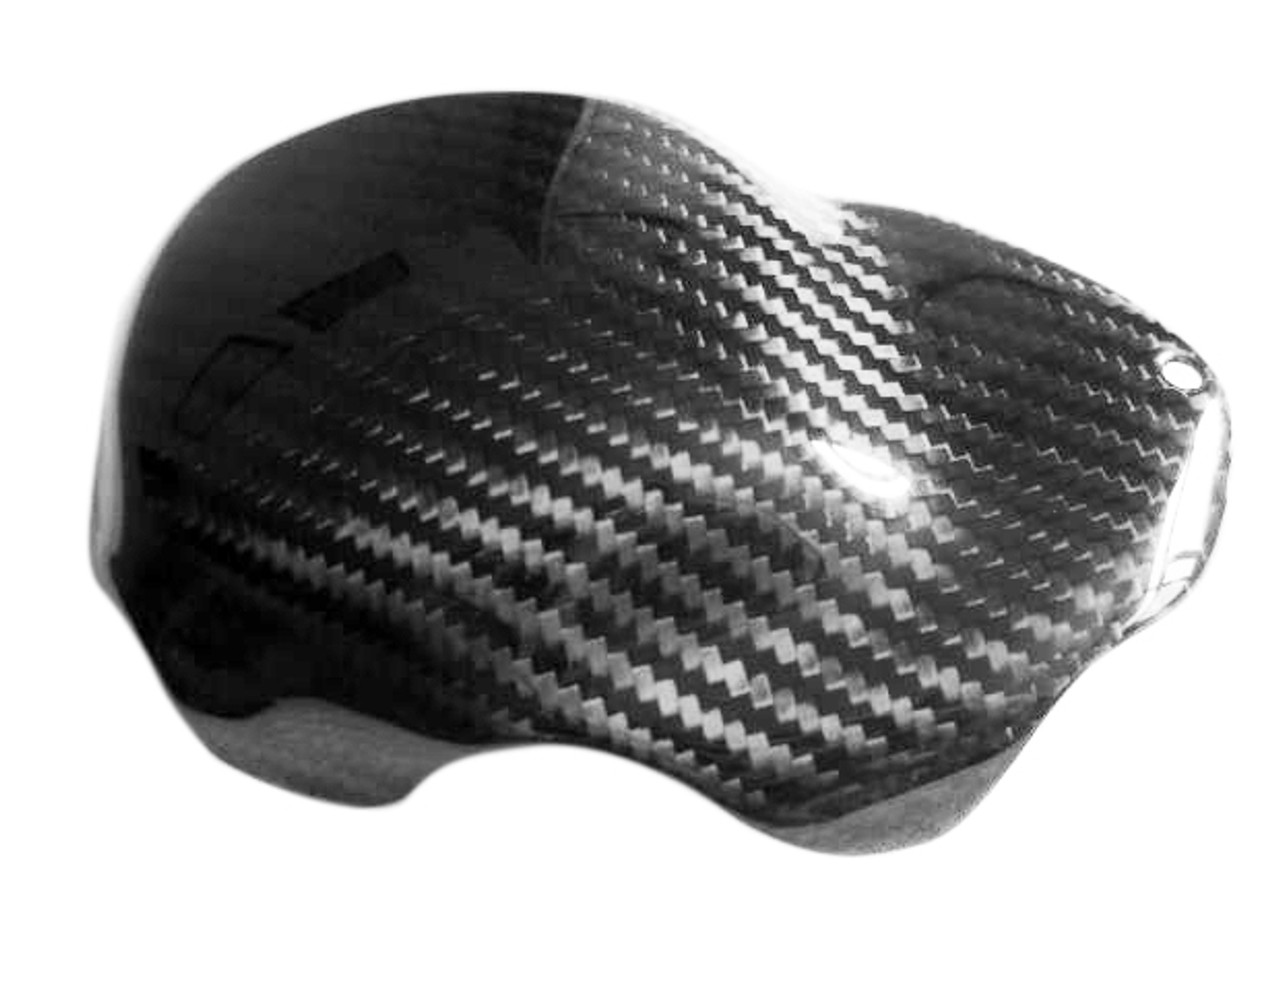 Glossy Twill Weave Carbon Fiber Alternator Cover Guard for Yamaha R1 04-08, FZ-1 06-13, FZ8 10-13